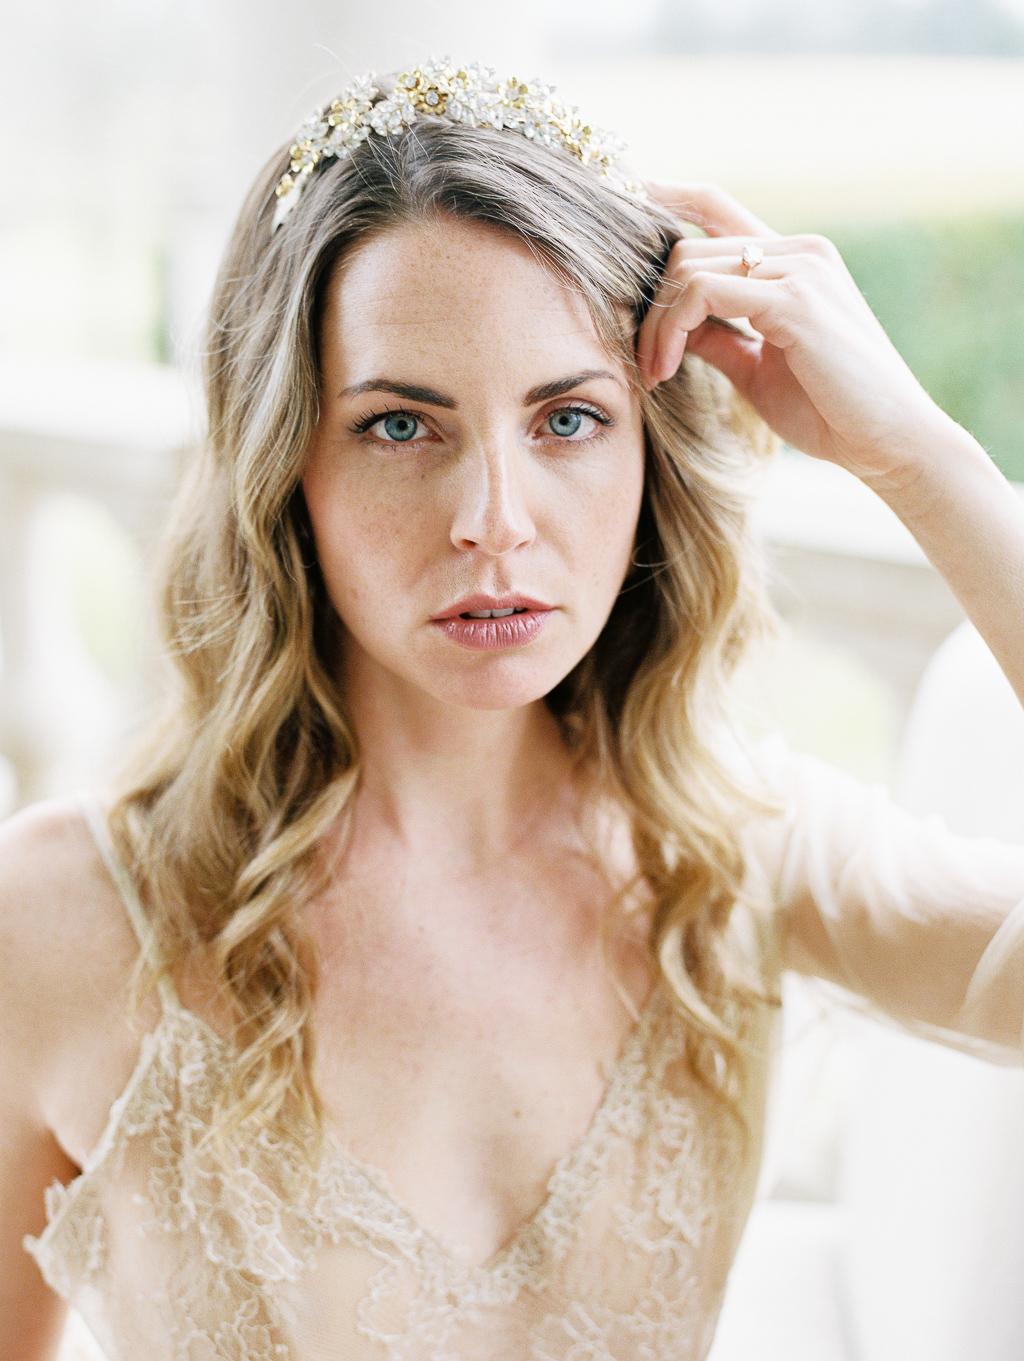 lindsay-k-weller-american-boudoir-model-actress